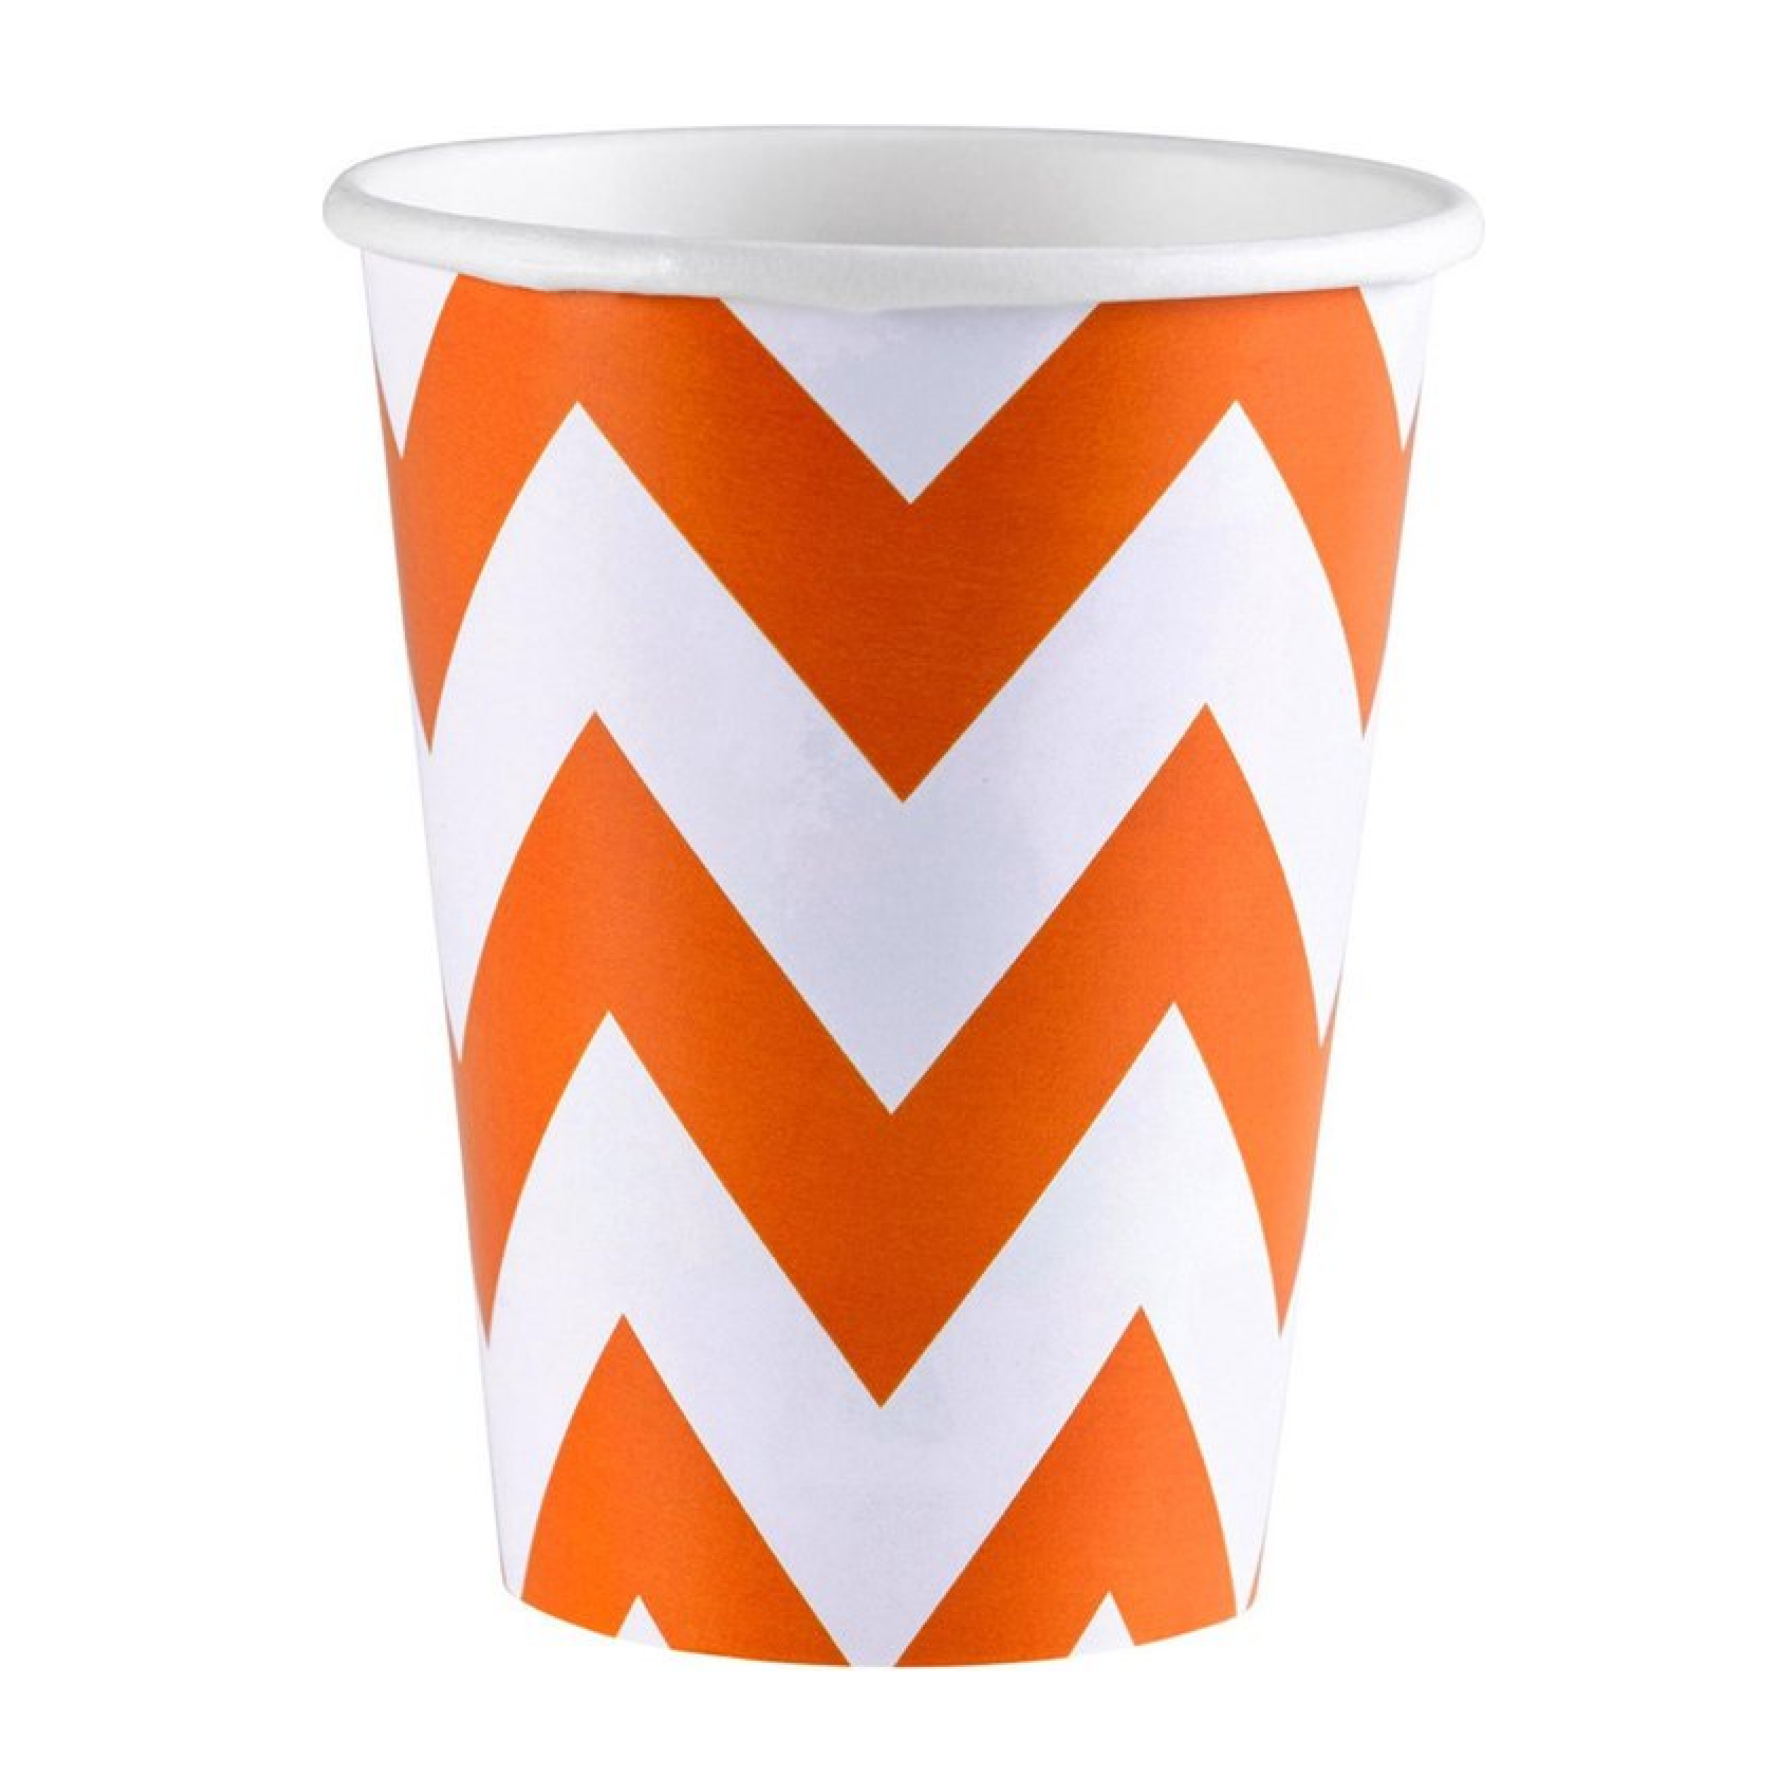 Bekers - Oranje amp wit - Zigzag - Karton - 8st.